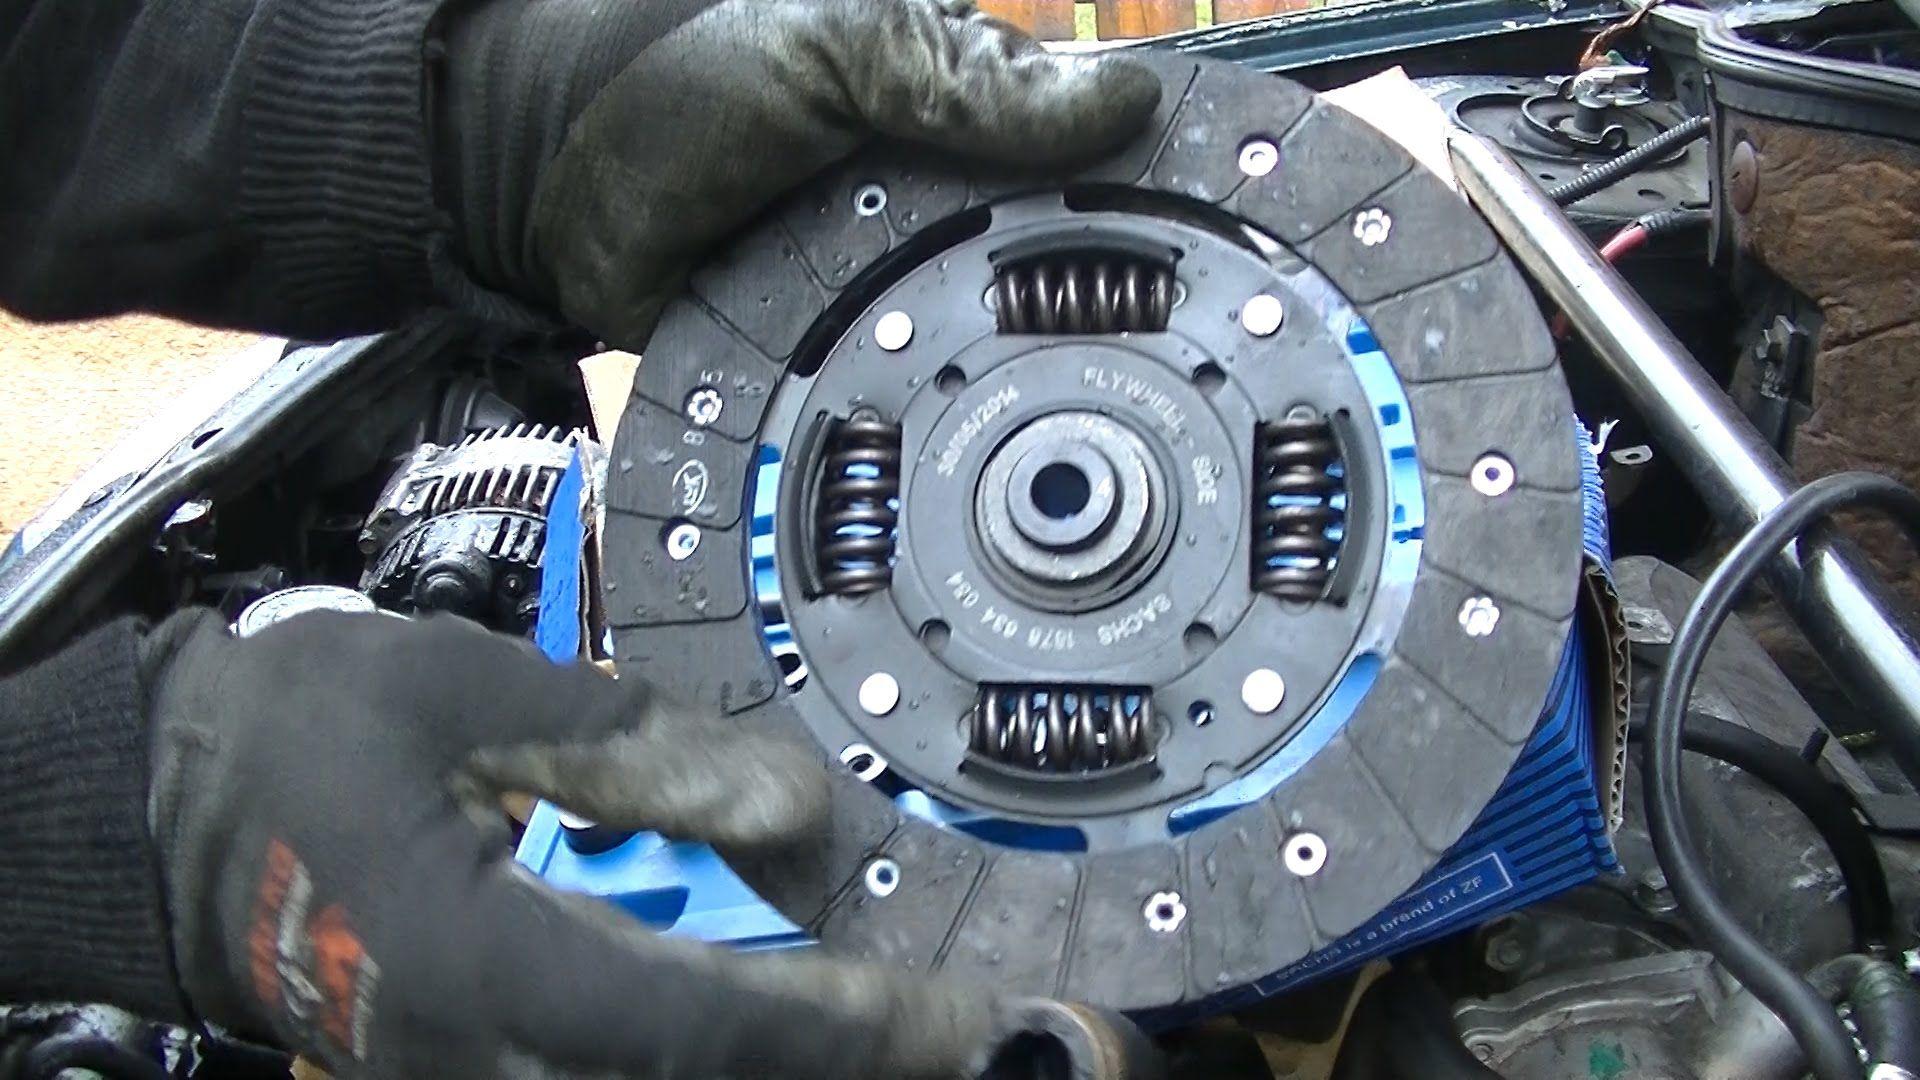 Clutch Replacement Part 2 Clutch Refitting Refit Replacement Parts Vehicle Gauge